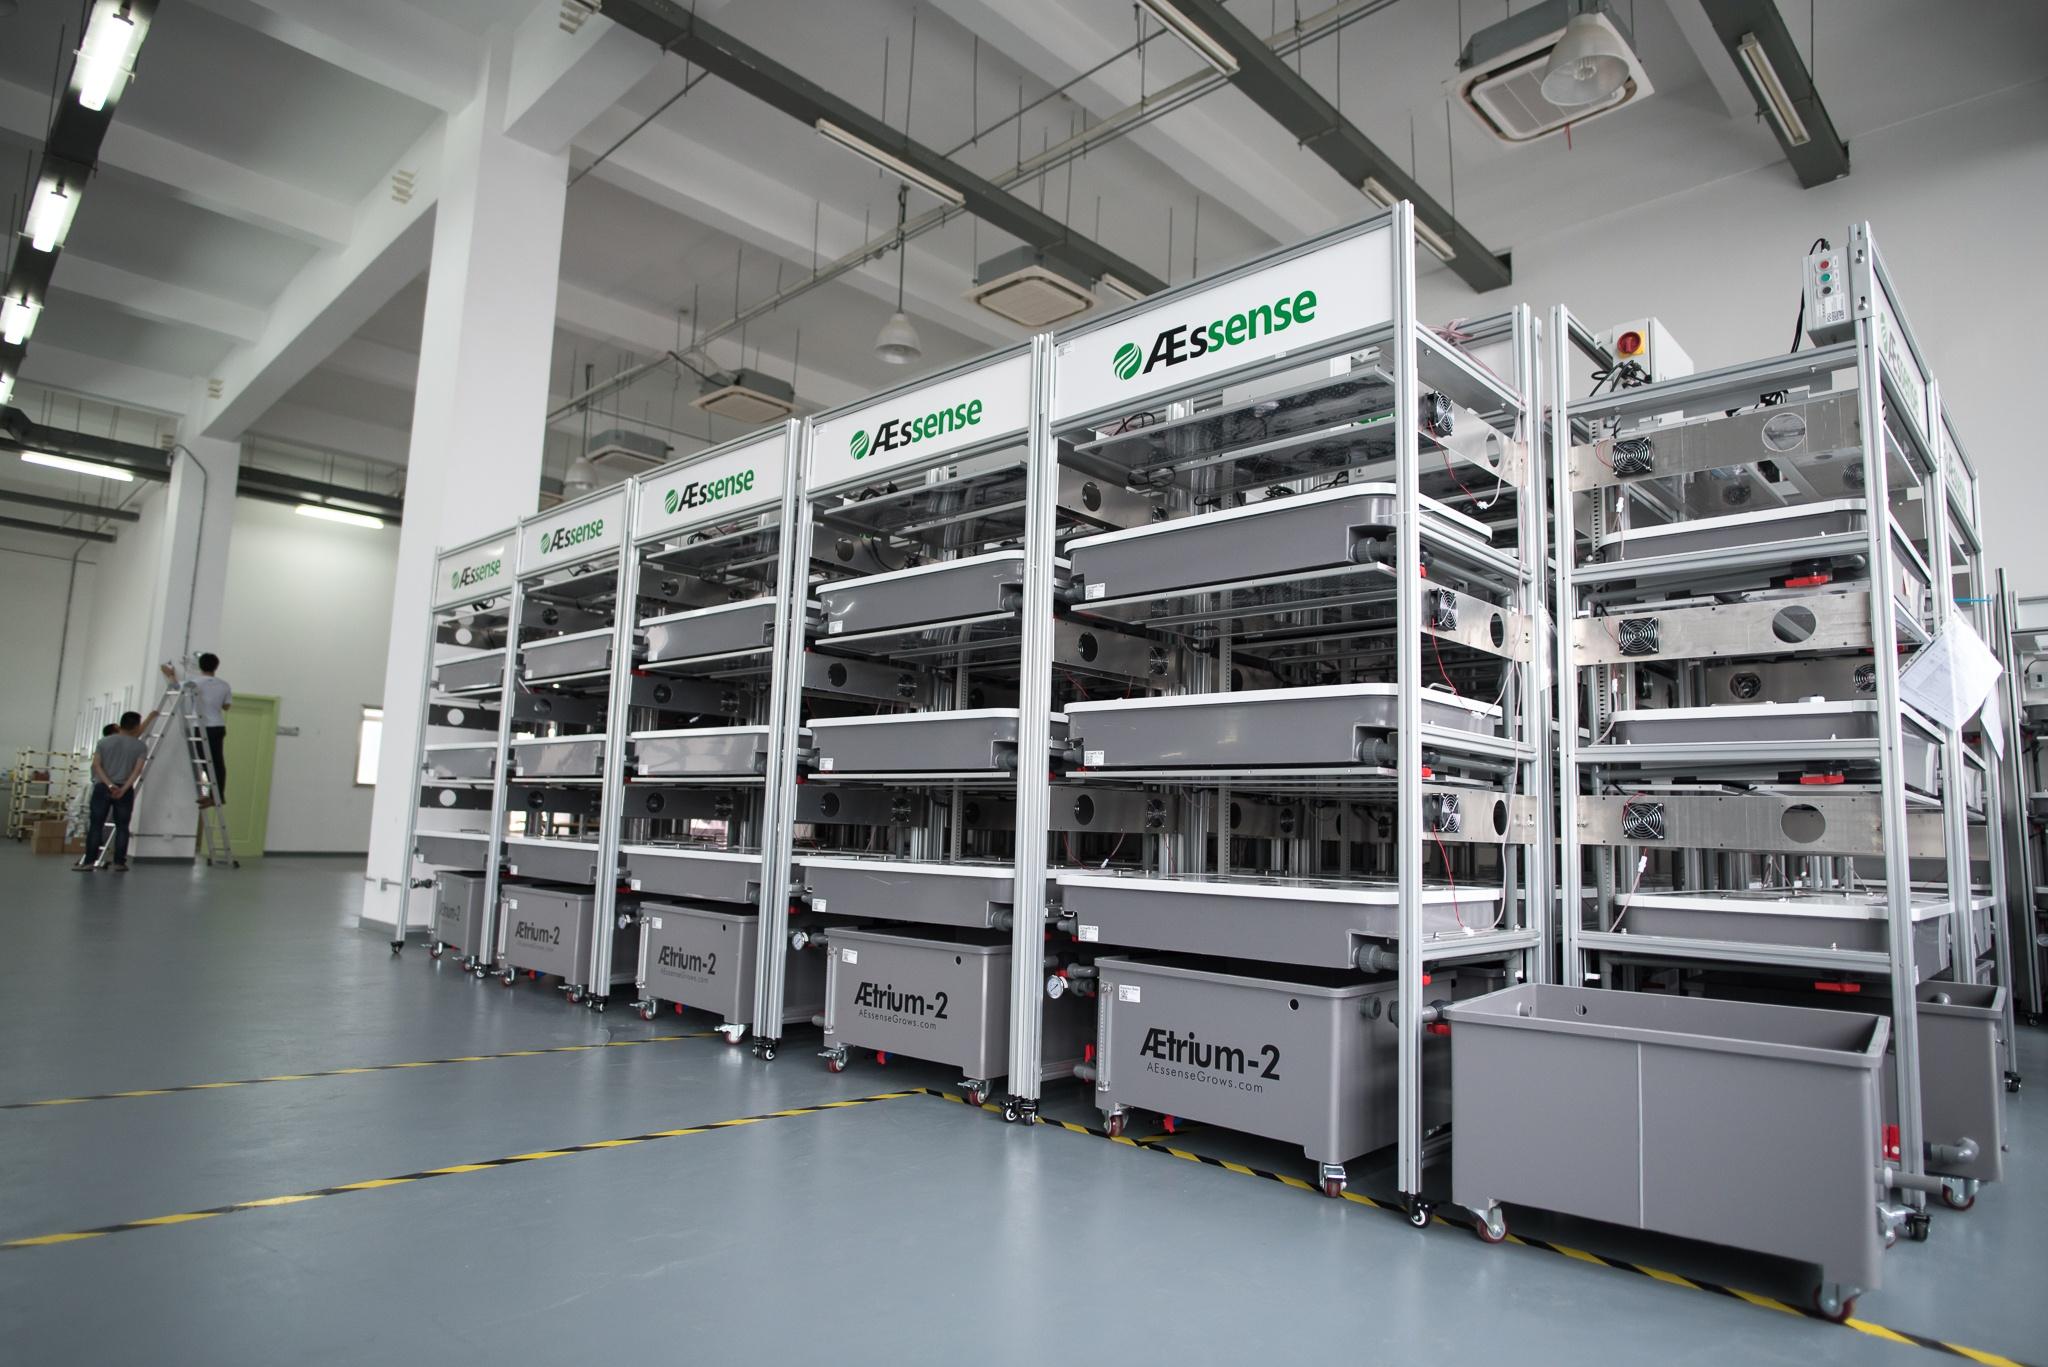 AEssenseGrows Fresh AEtrium-2 Machine Rows